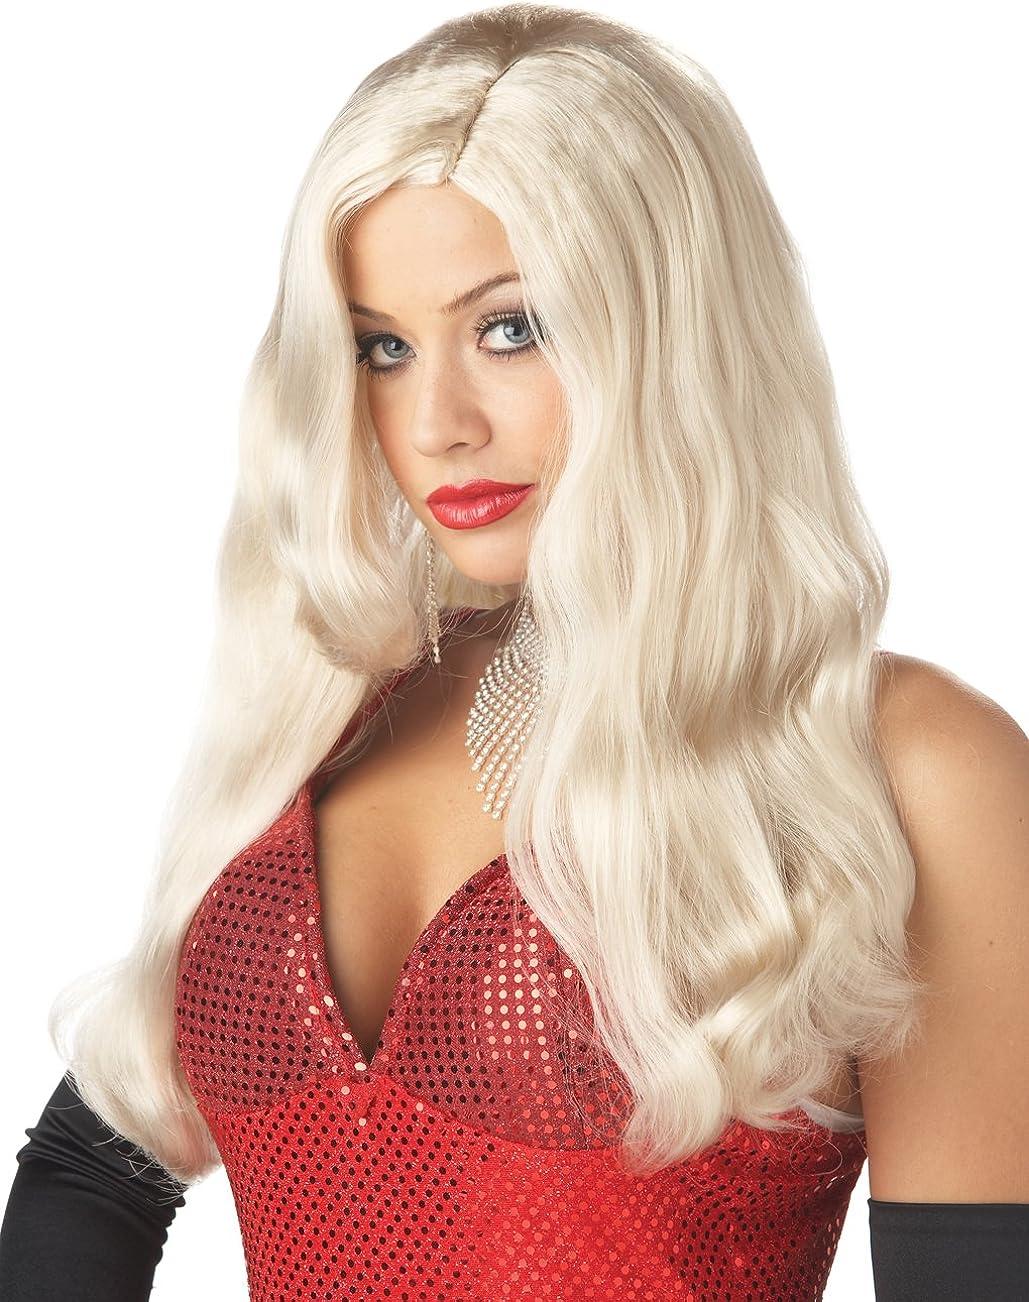 California Costumes Blonde Silver Sinsation Save money Screen Wig Max 78% OFF